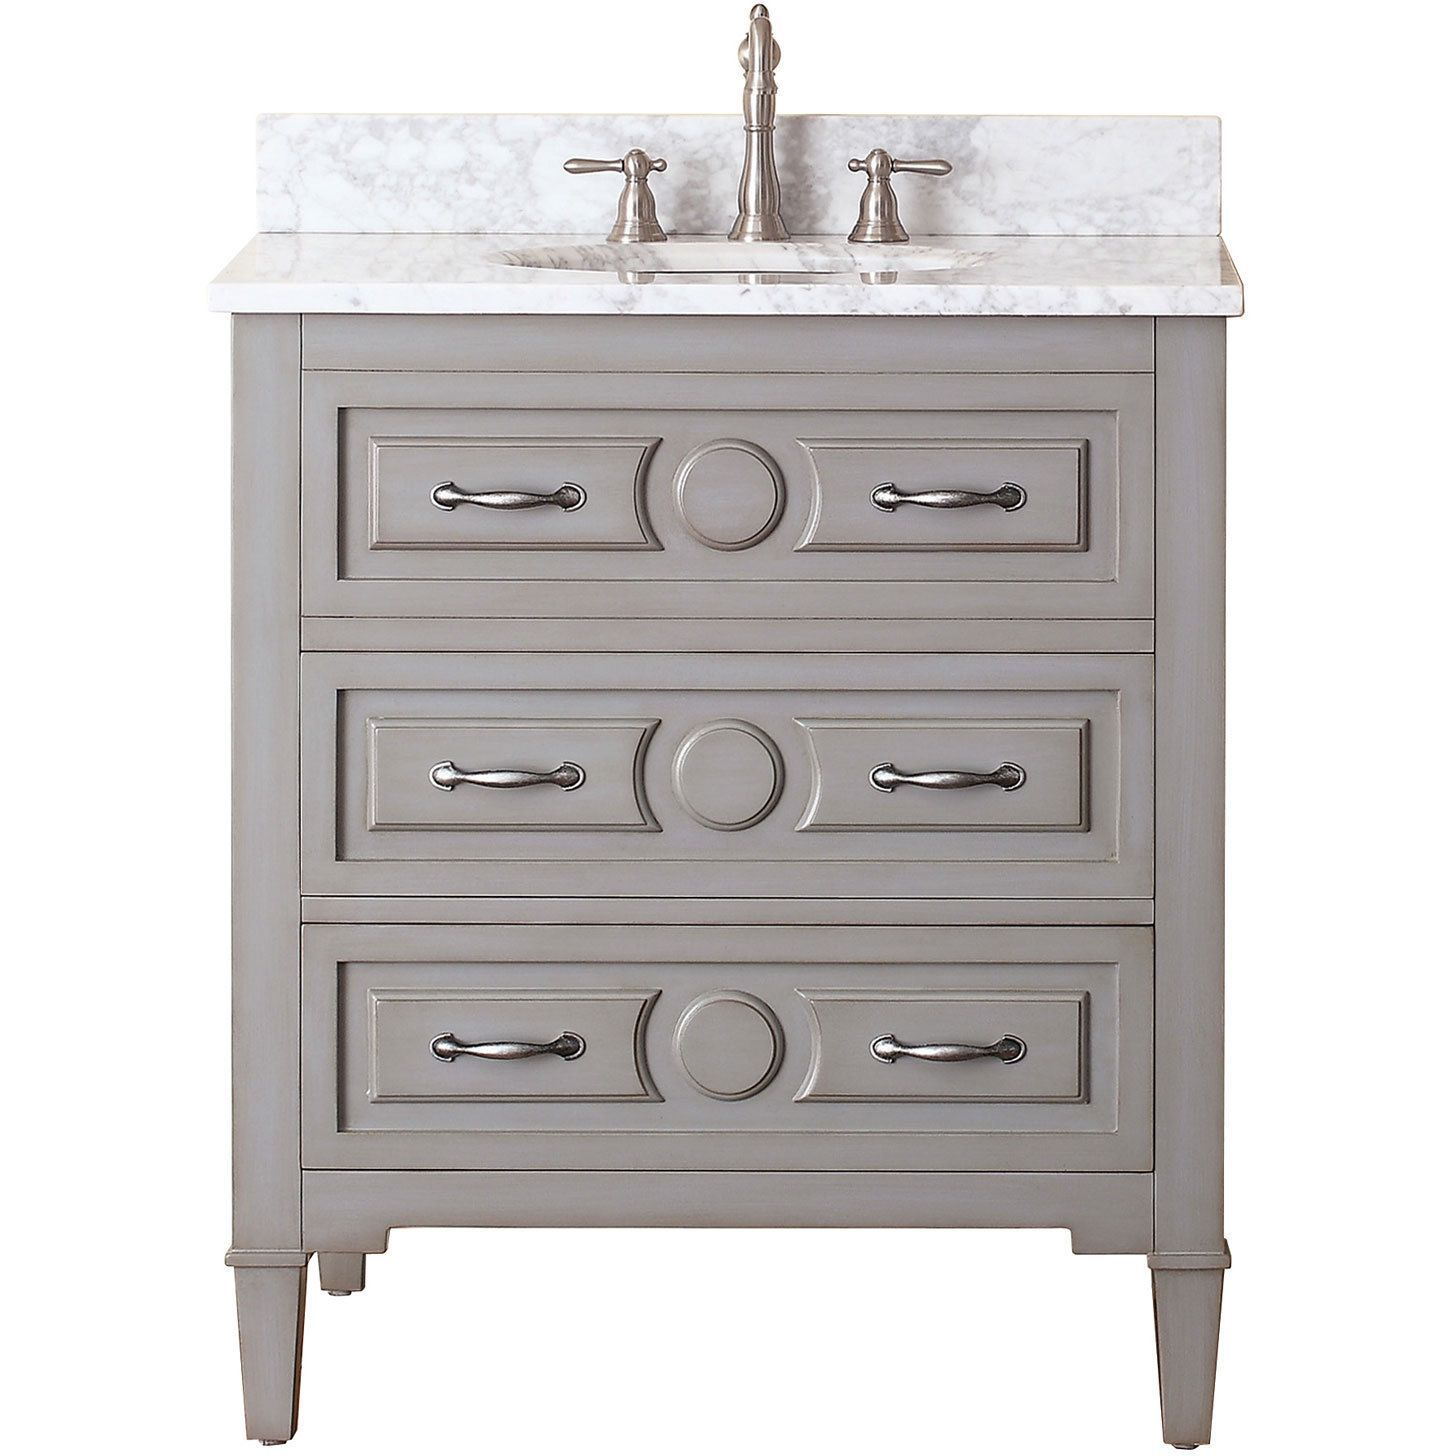 Avanity Kelly 30 Inch Vanity Combo In Grayish Blue With Top And Sink Vanity Combos Bathroom Vanity Combo Single Bathroom Vanity